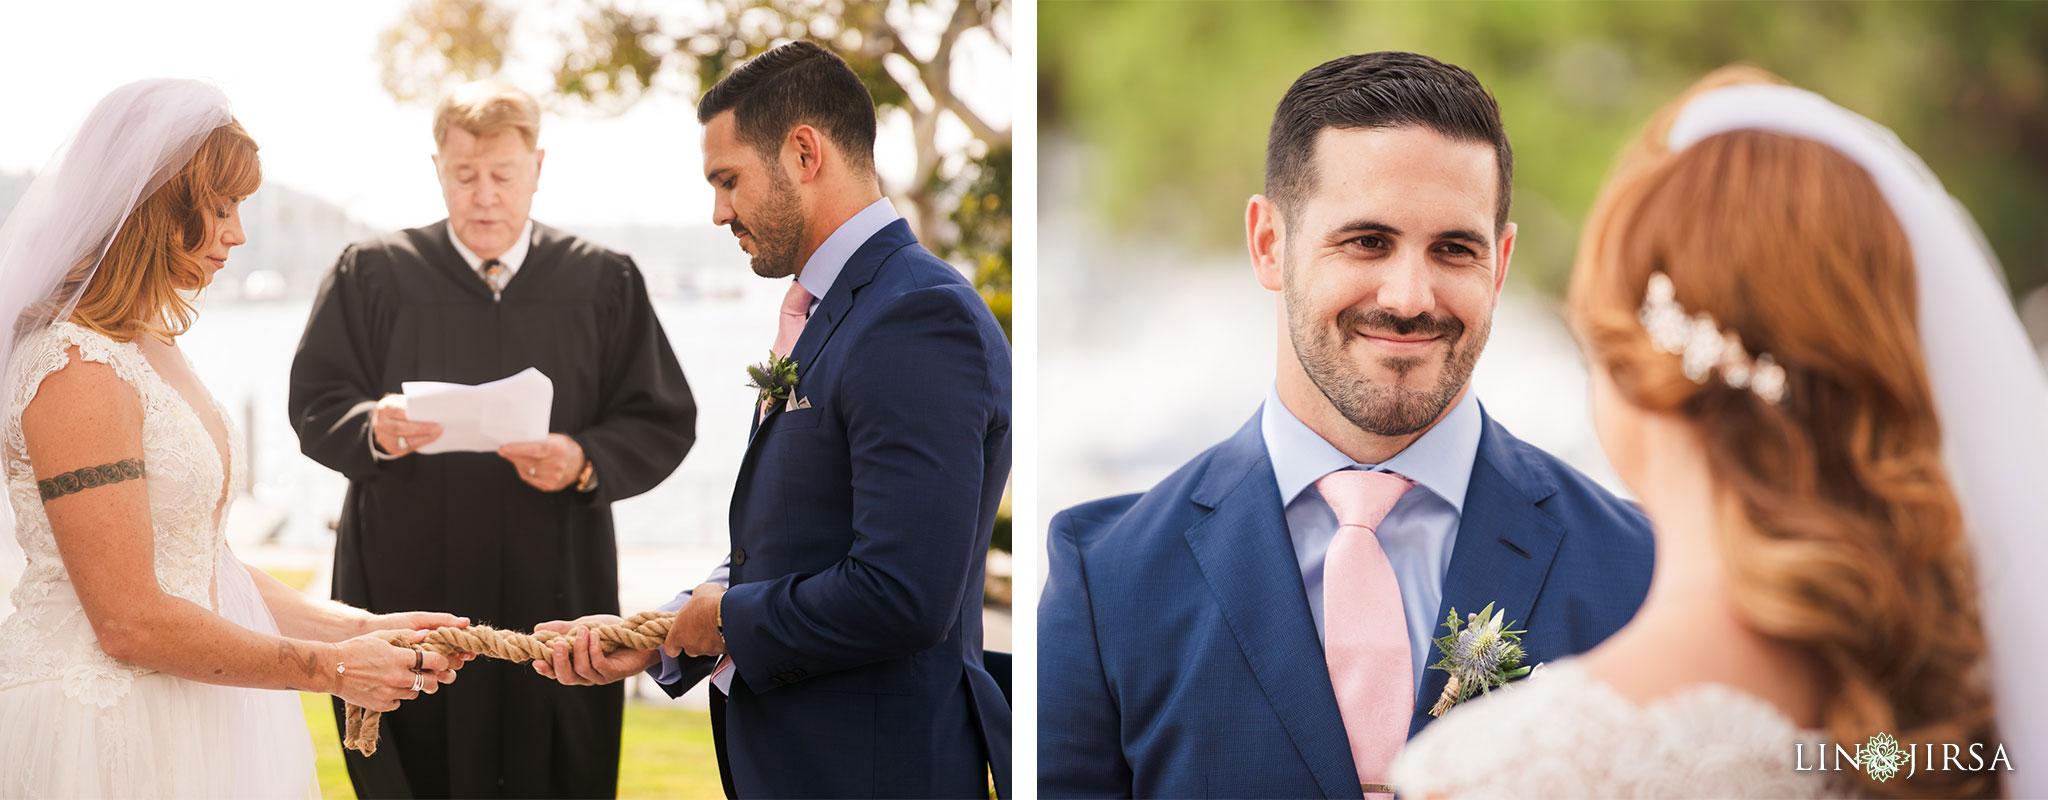 017 marina del rey hotel wedding photography